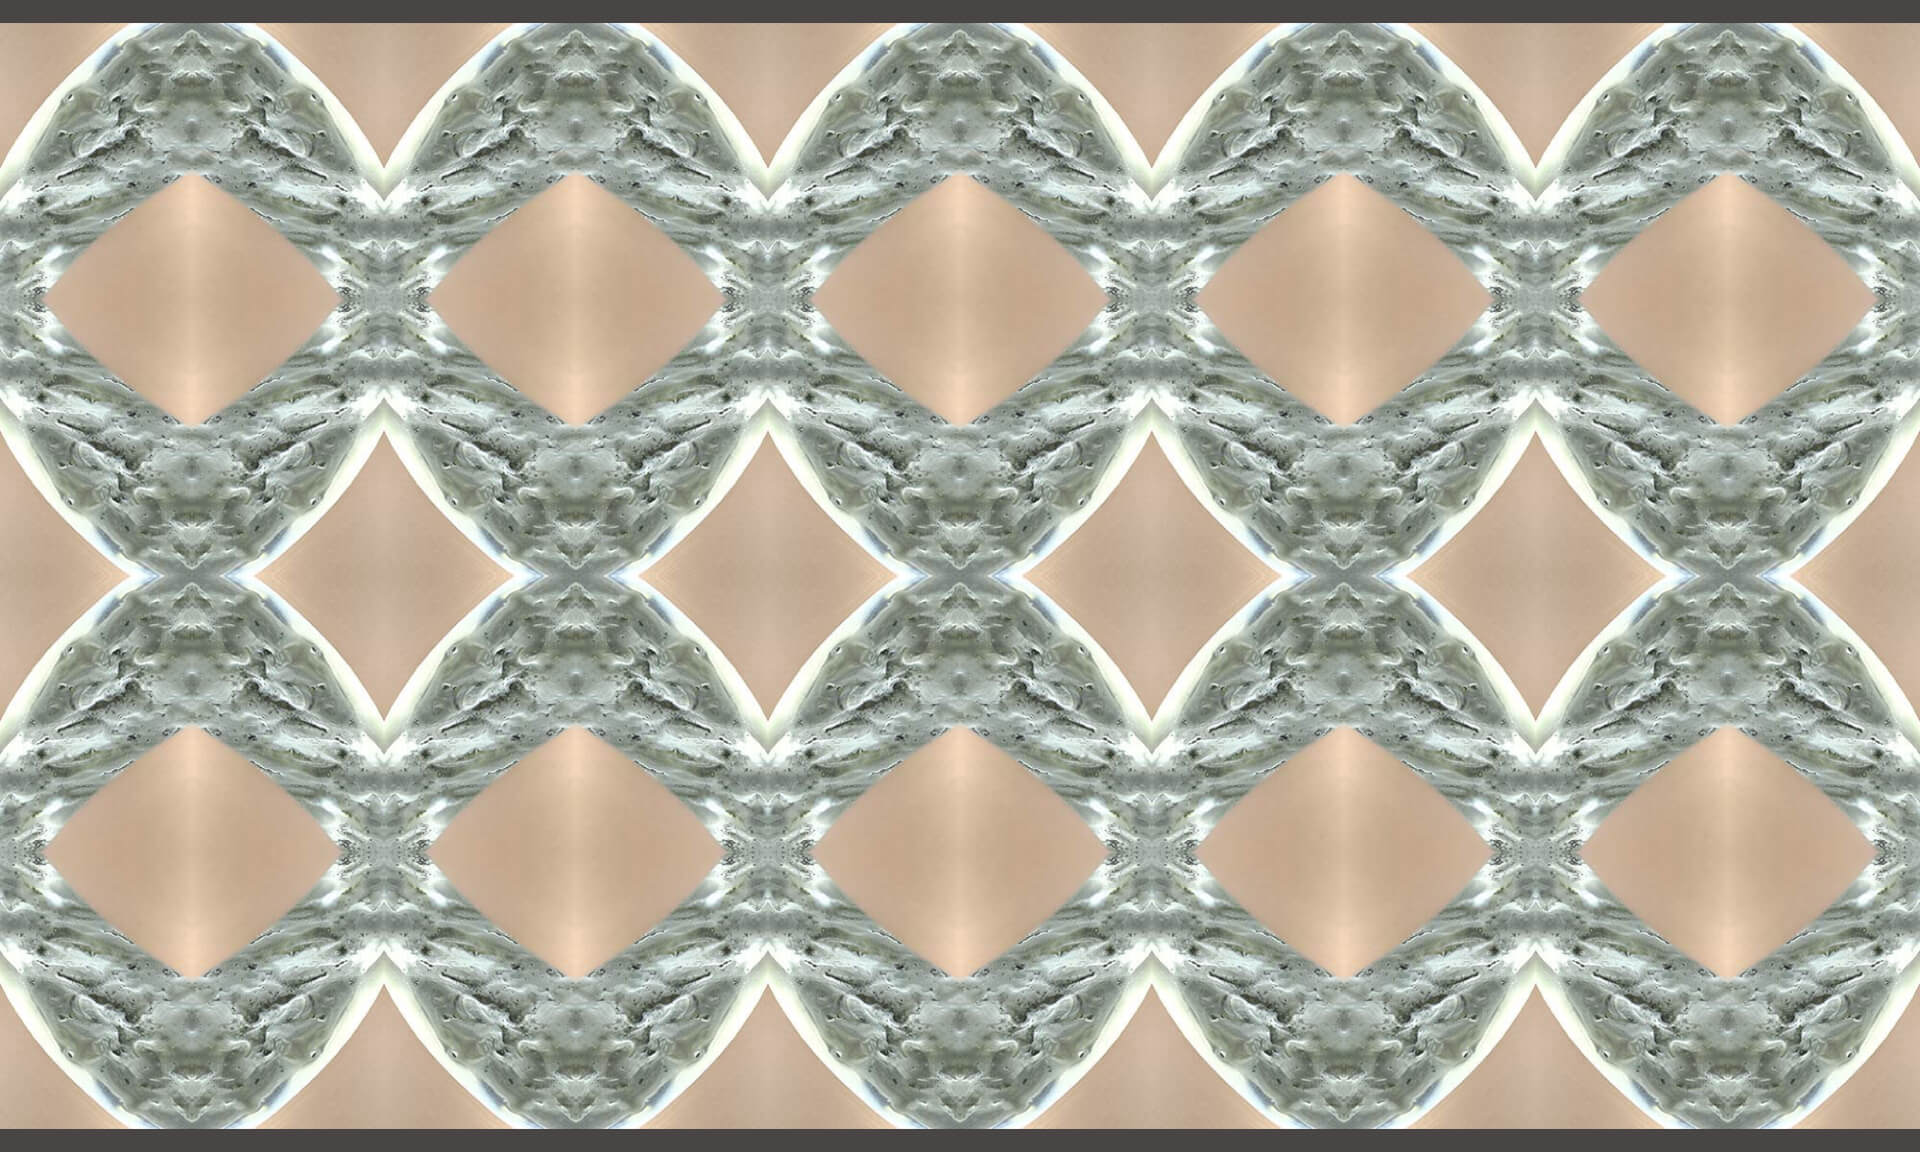 Rings-Variation2 MA0294 Doug Garrabrants